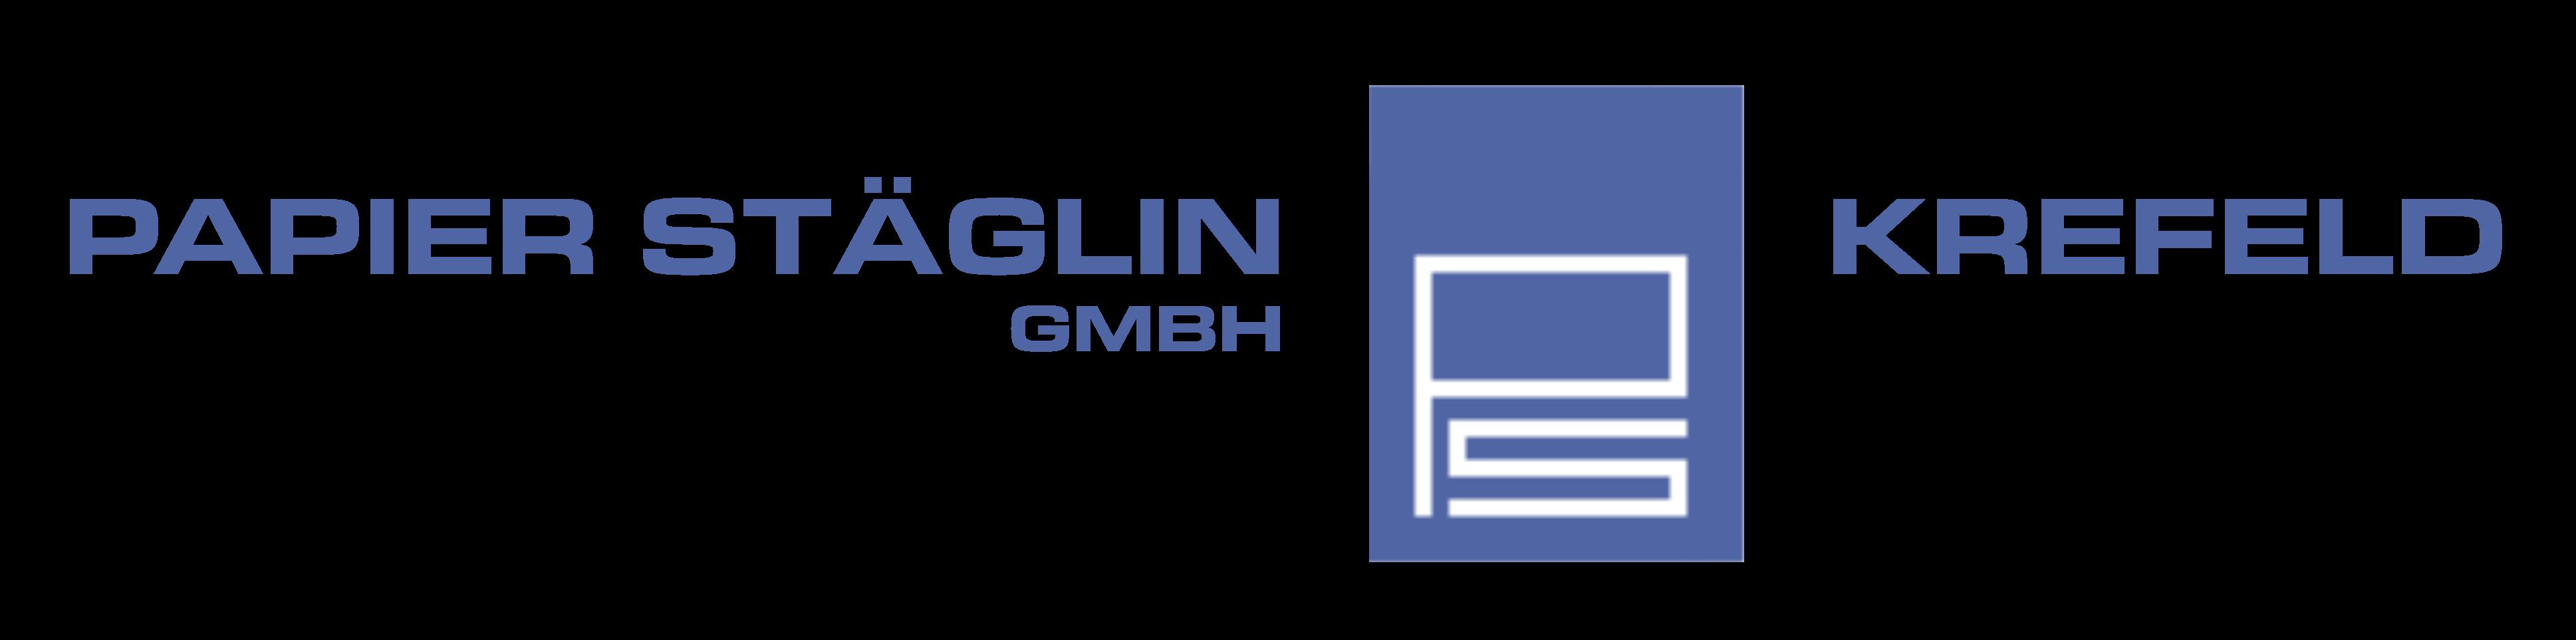 Papier Stäglin GmbH Logo